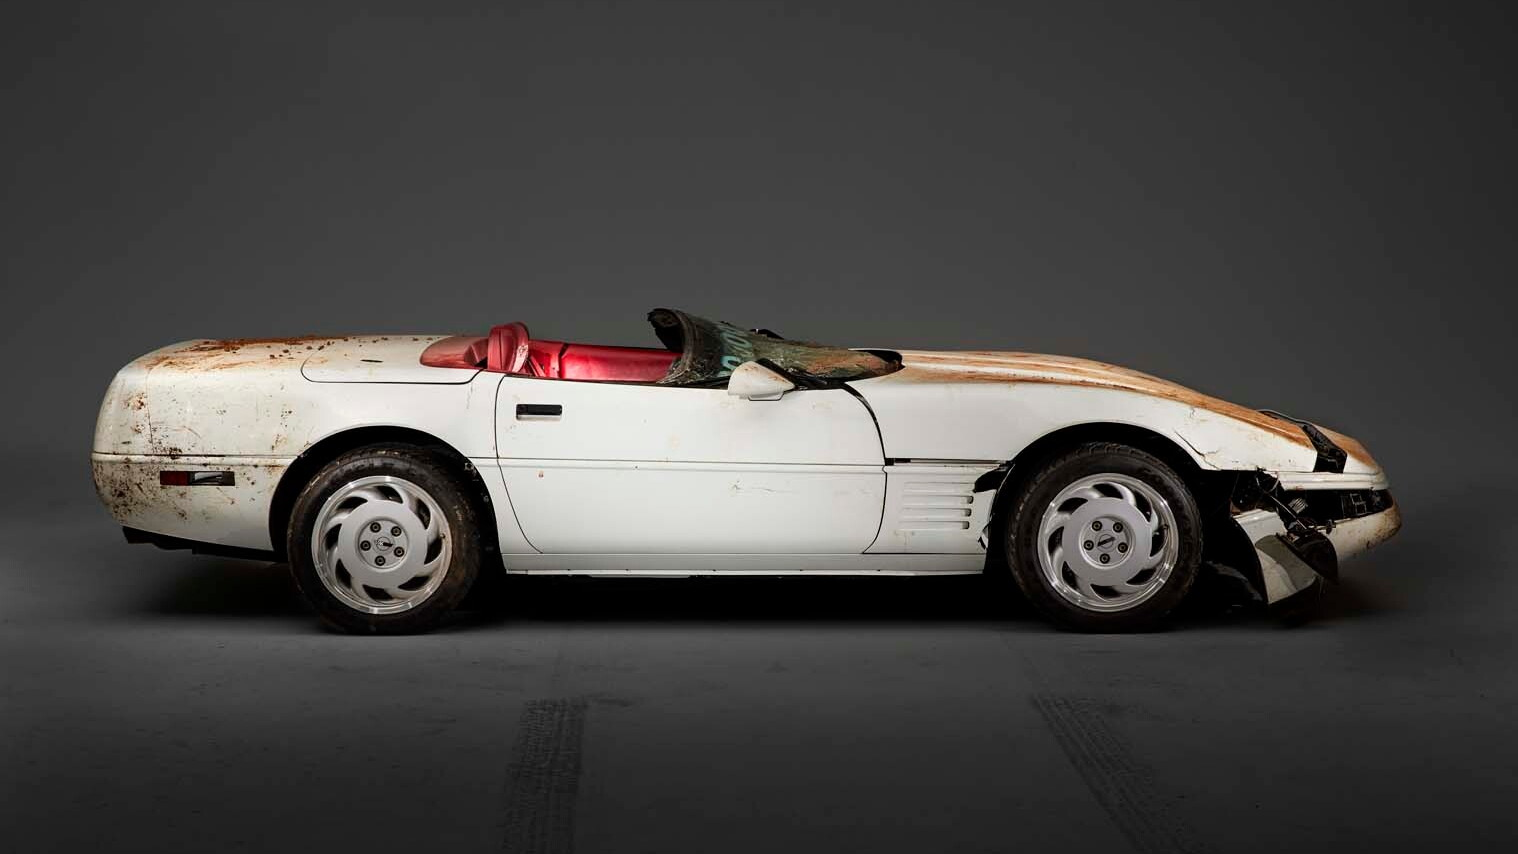 Millionth Corvette